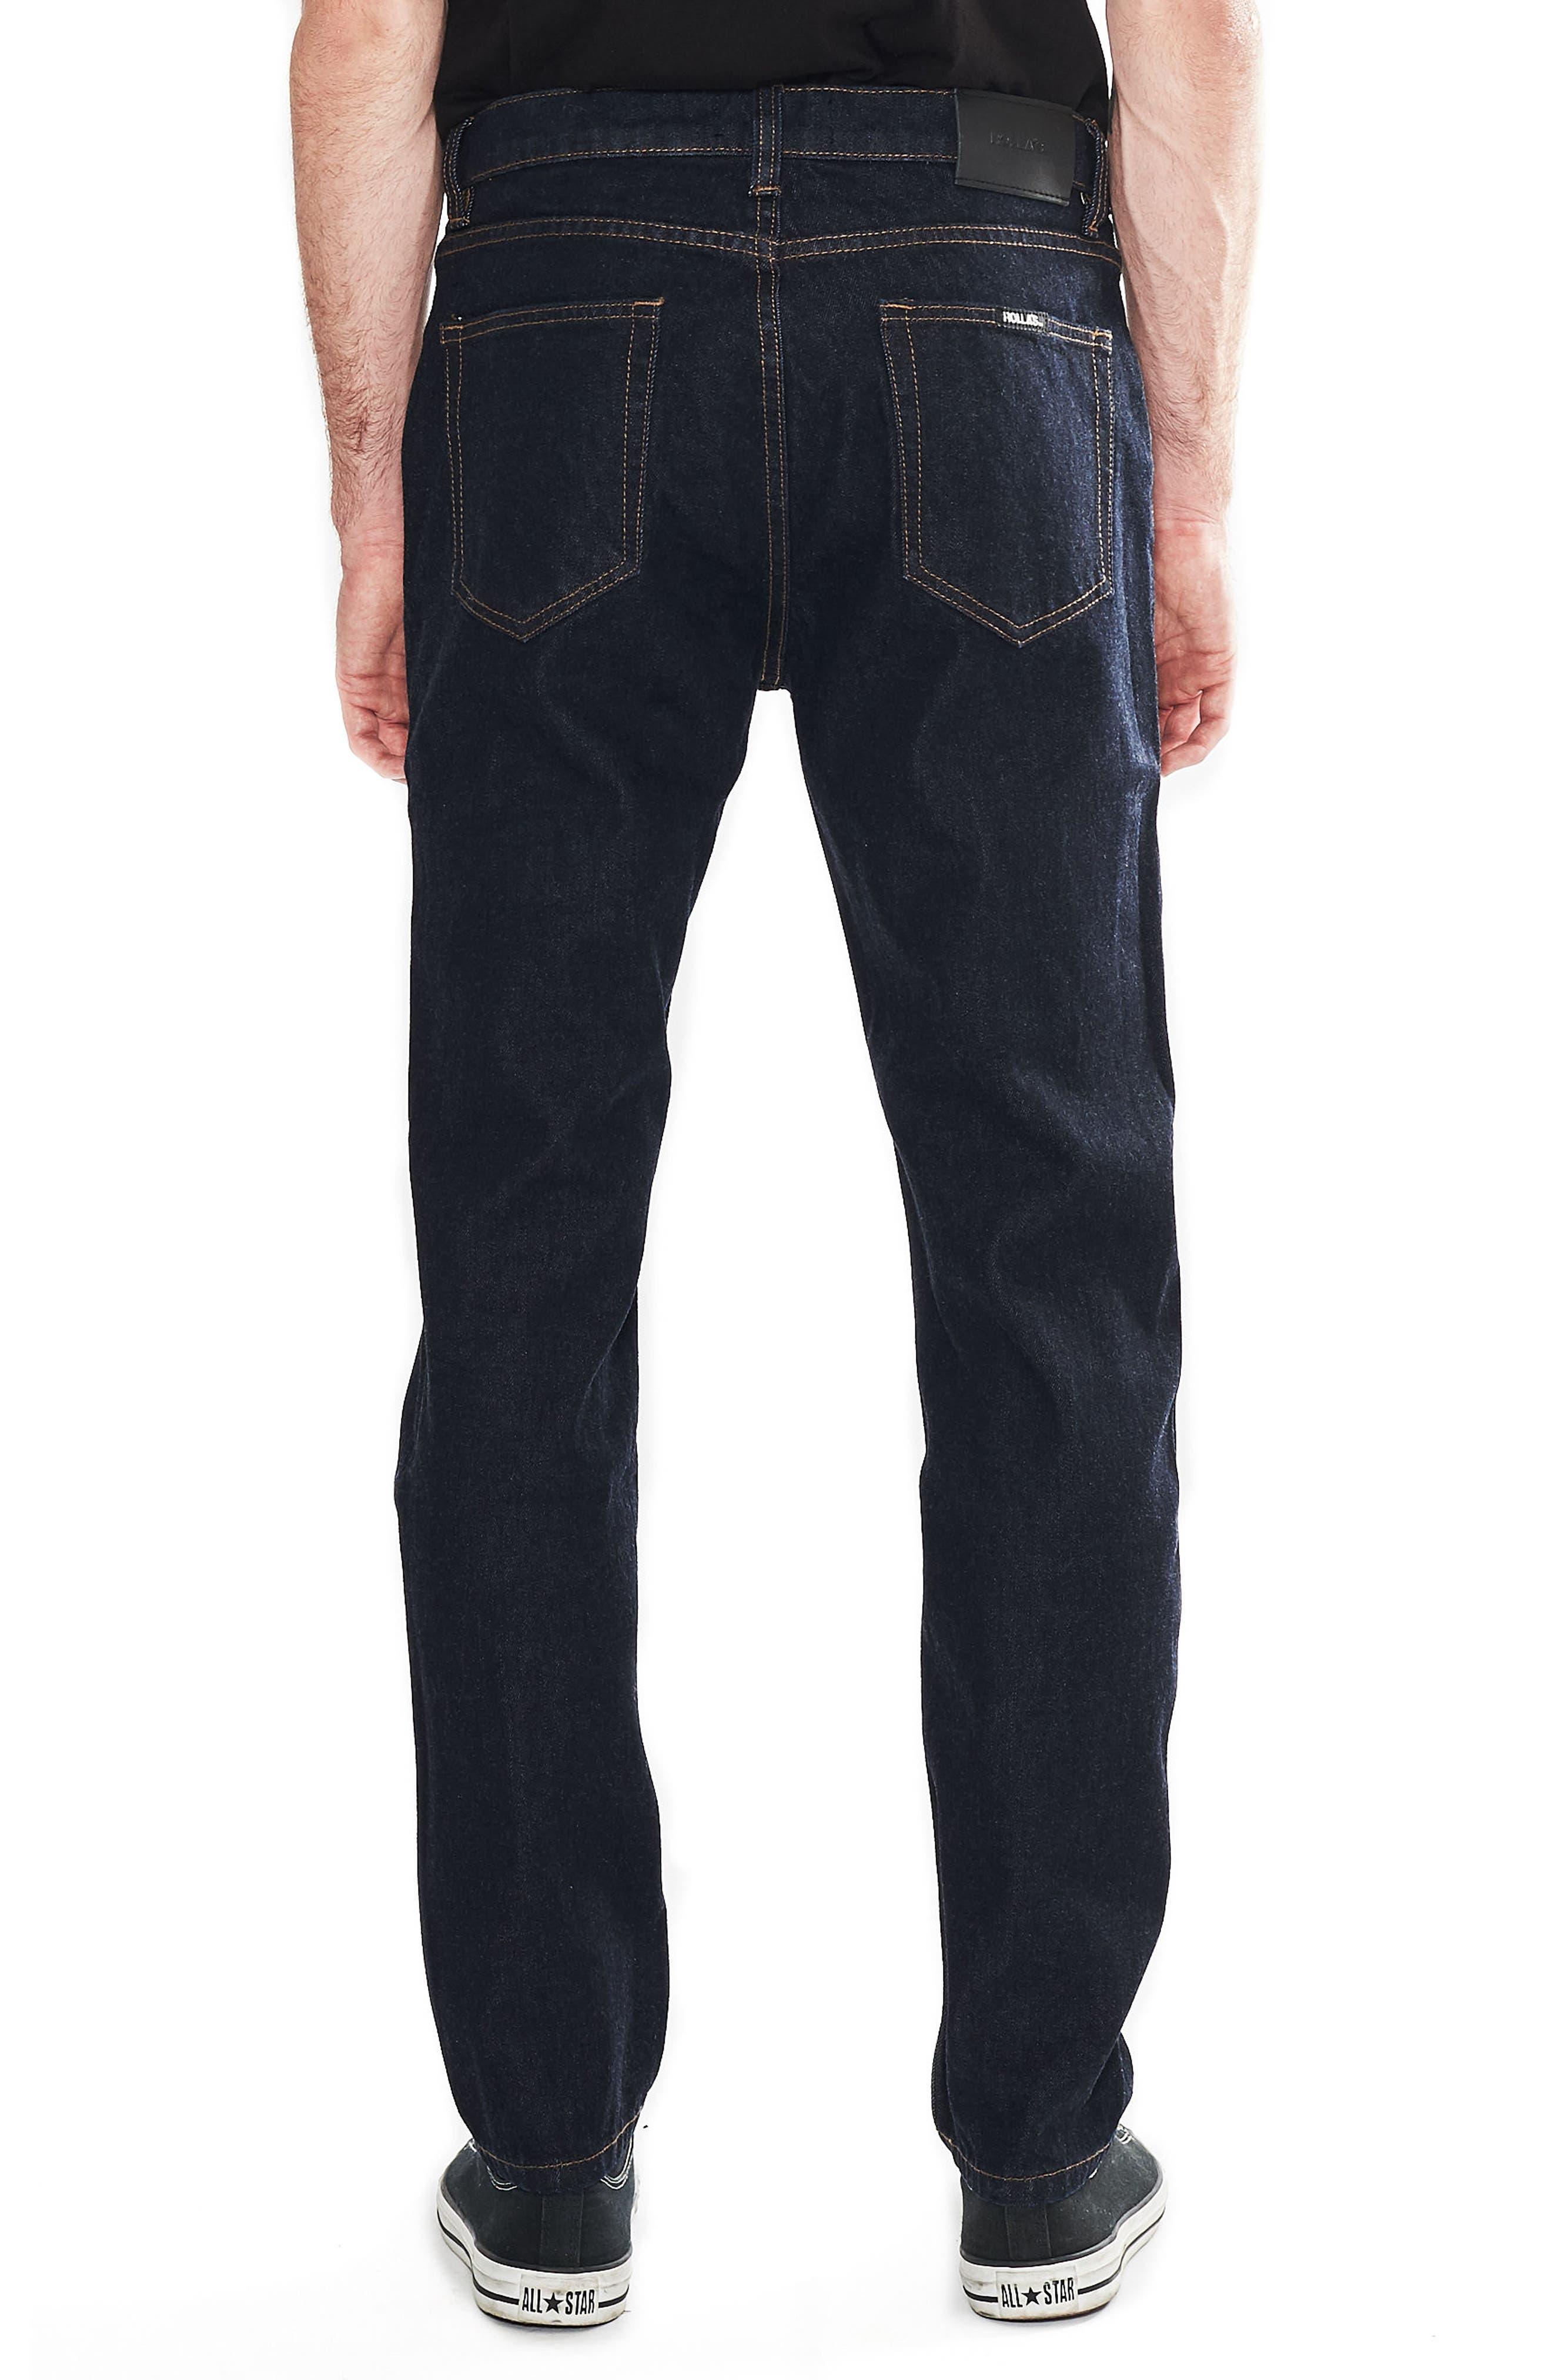 Tim Slims Slim Fit Jeans,                             Alternate thumbnail 2, color,                             Indigo Raw